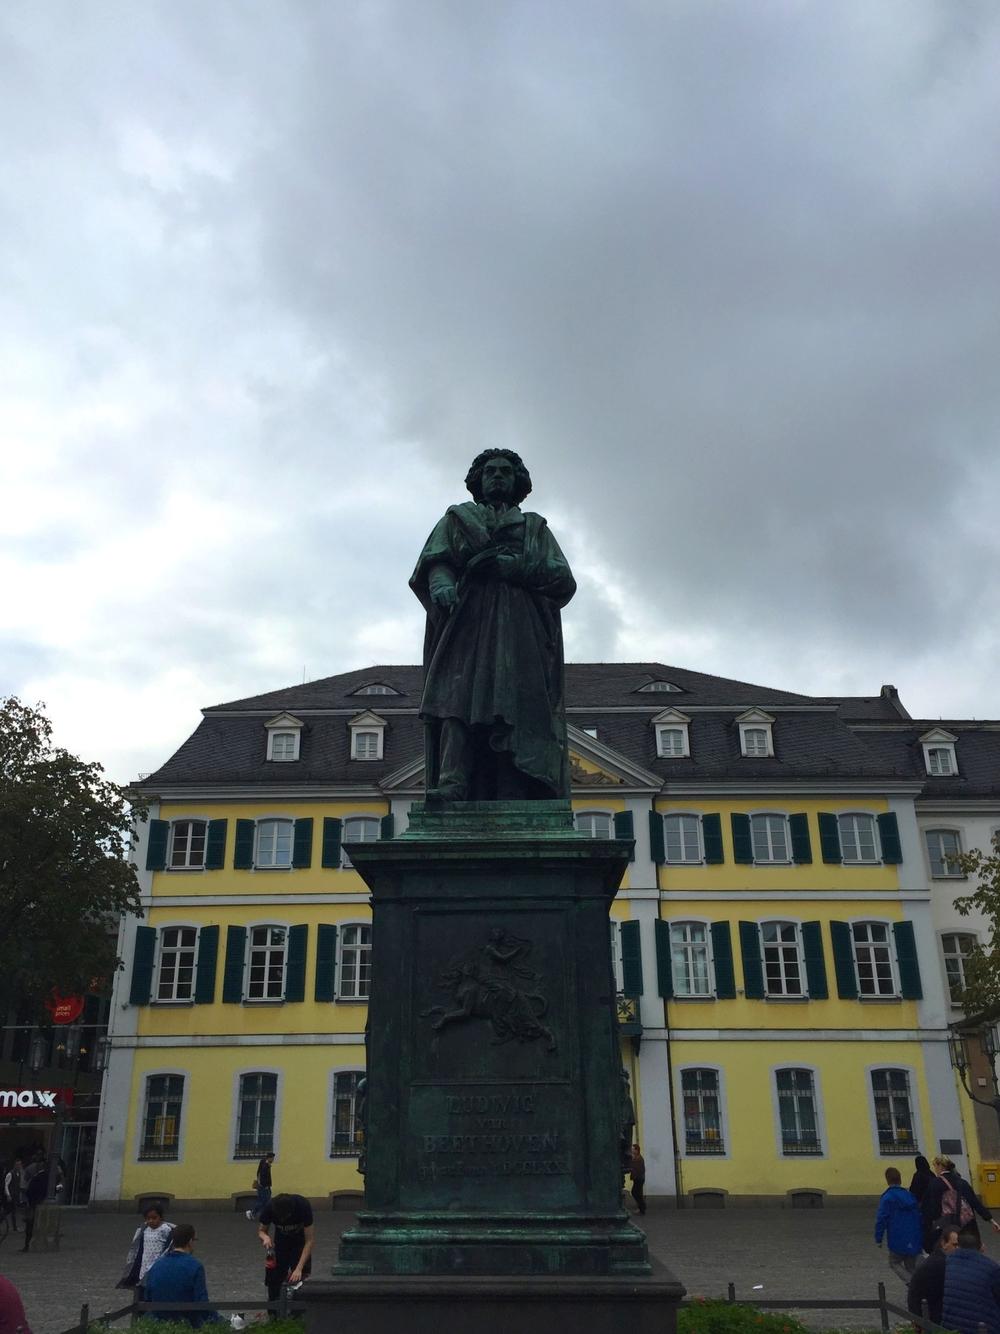 Bonn's famous son - Ludwig van Beethoven